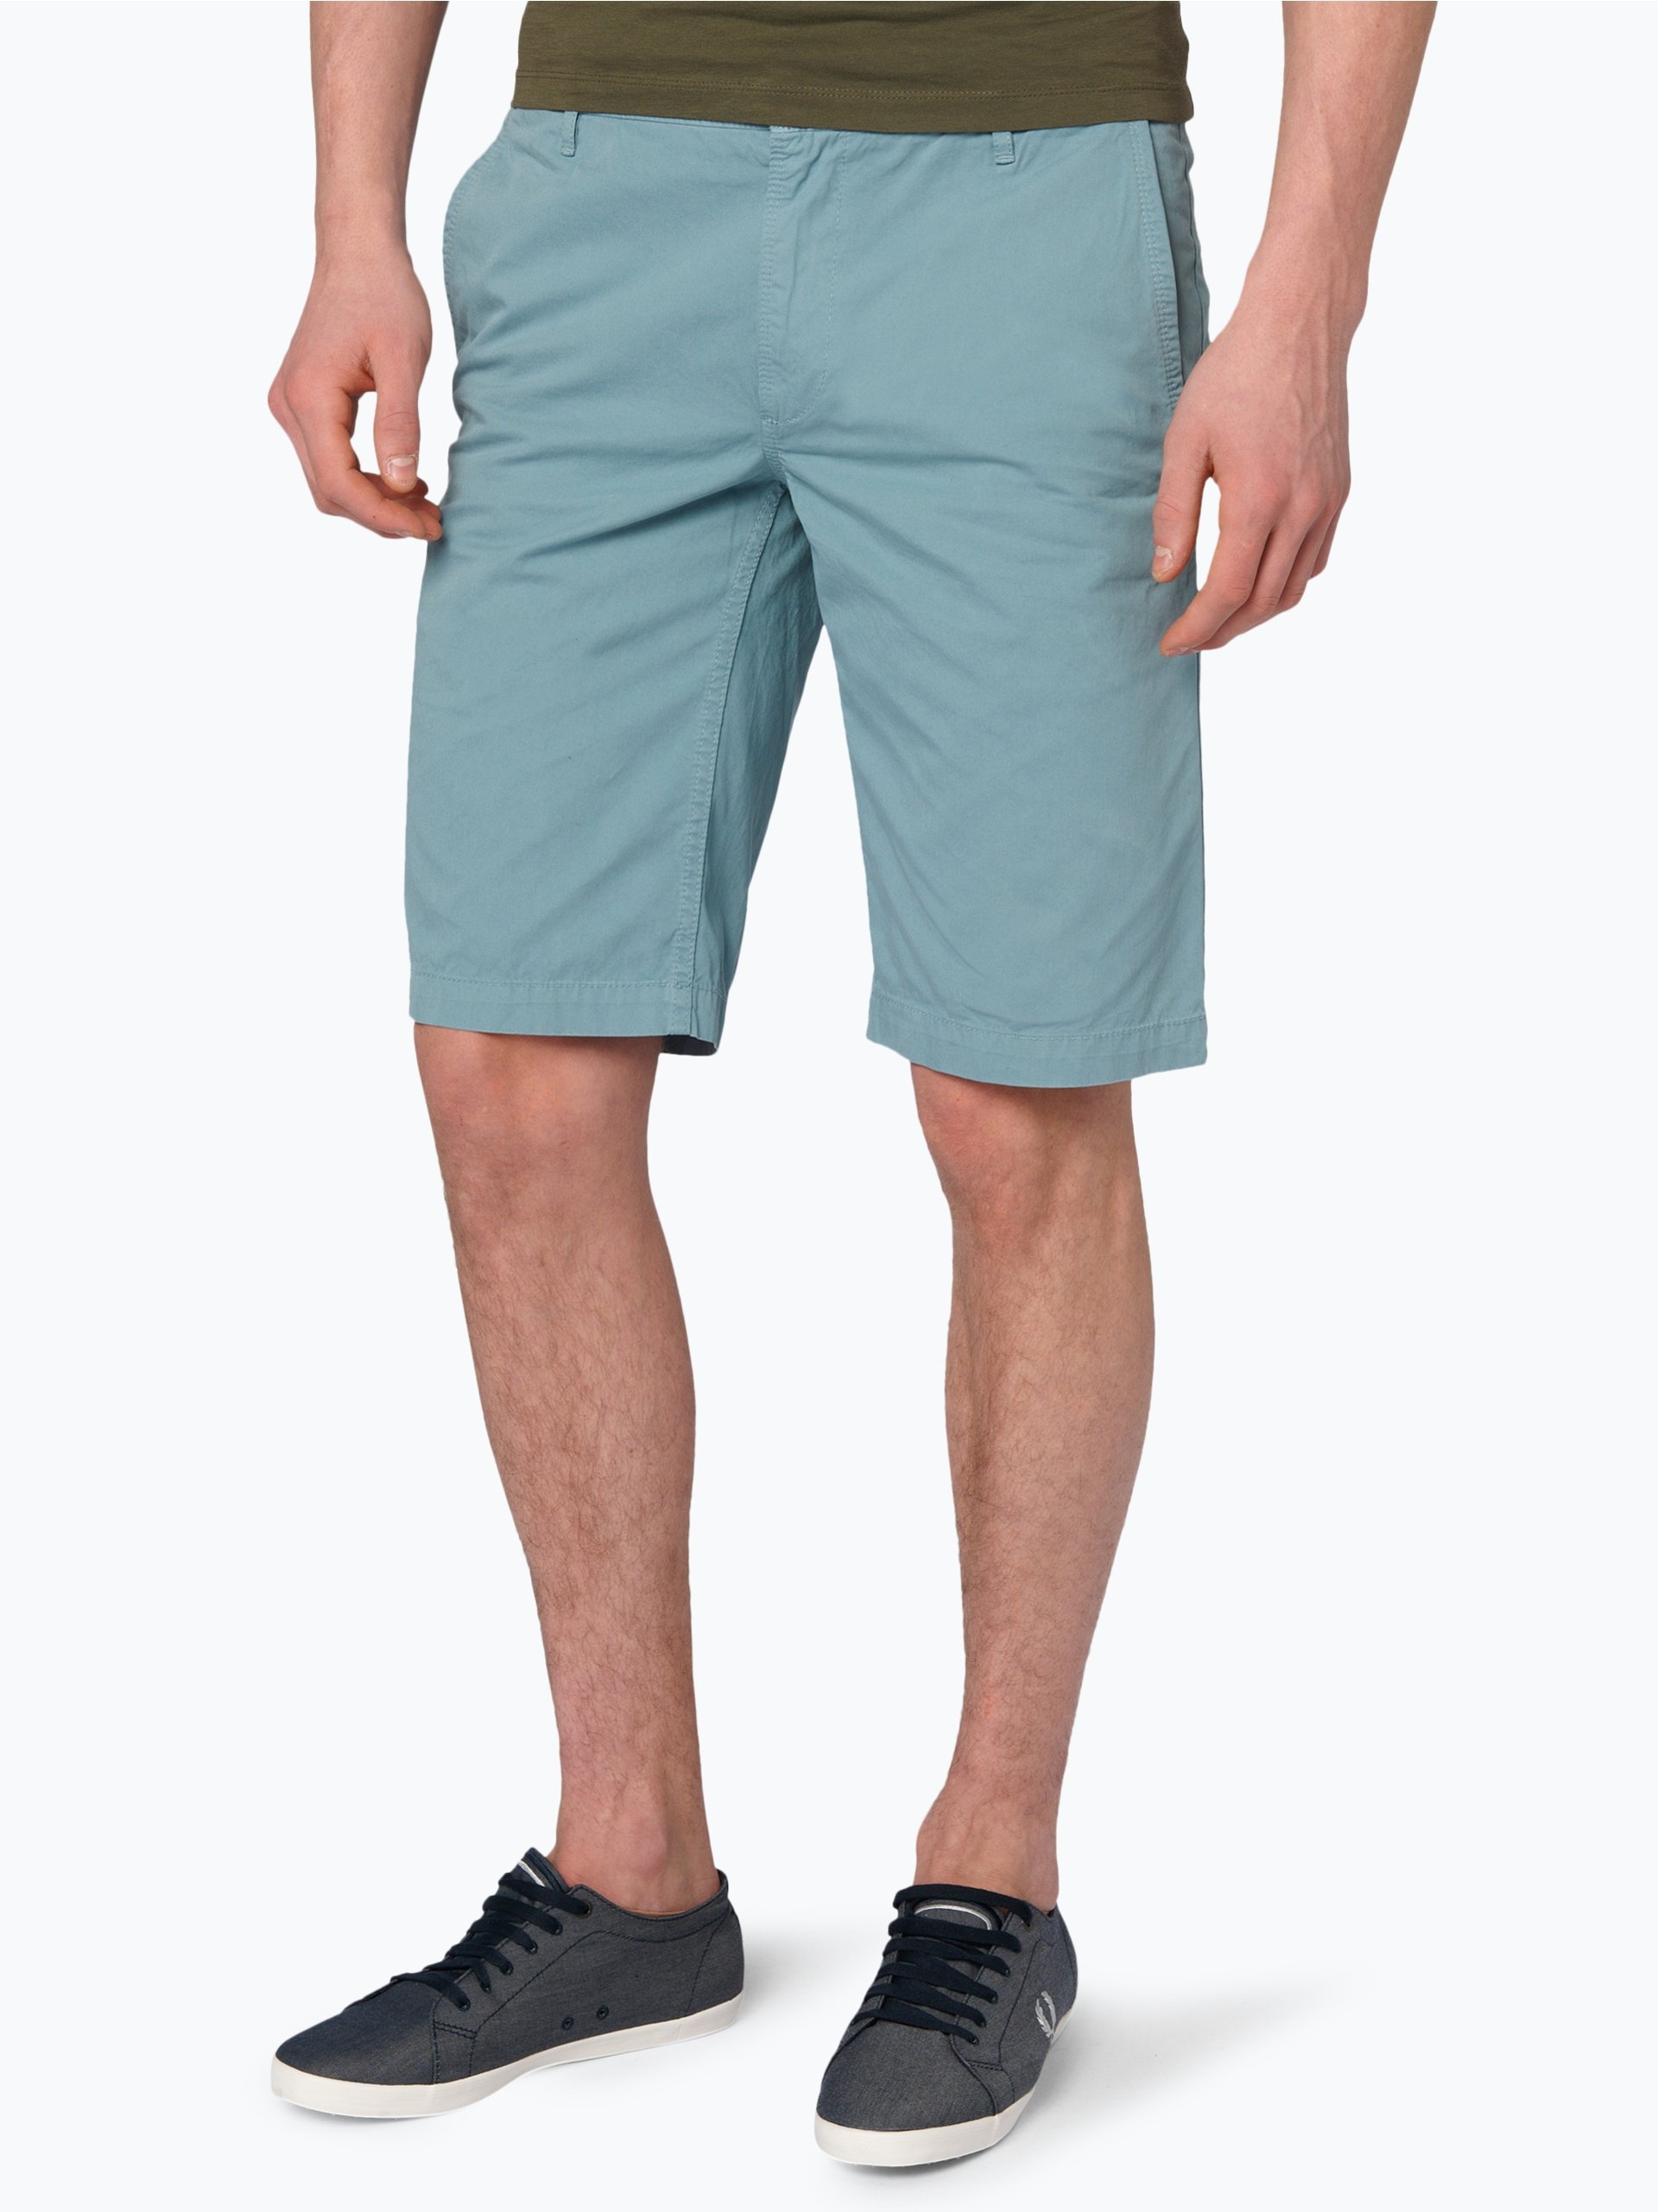 boss casual herren shorts schino shorts hellblau uni. Black Bedroom Furniture Sets. Home Design Ideas